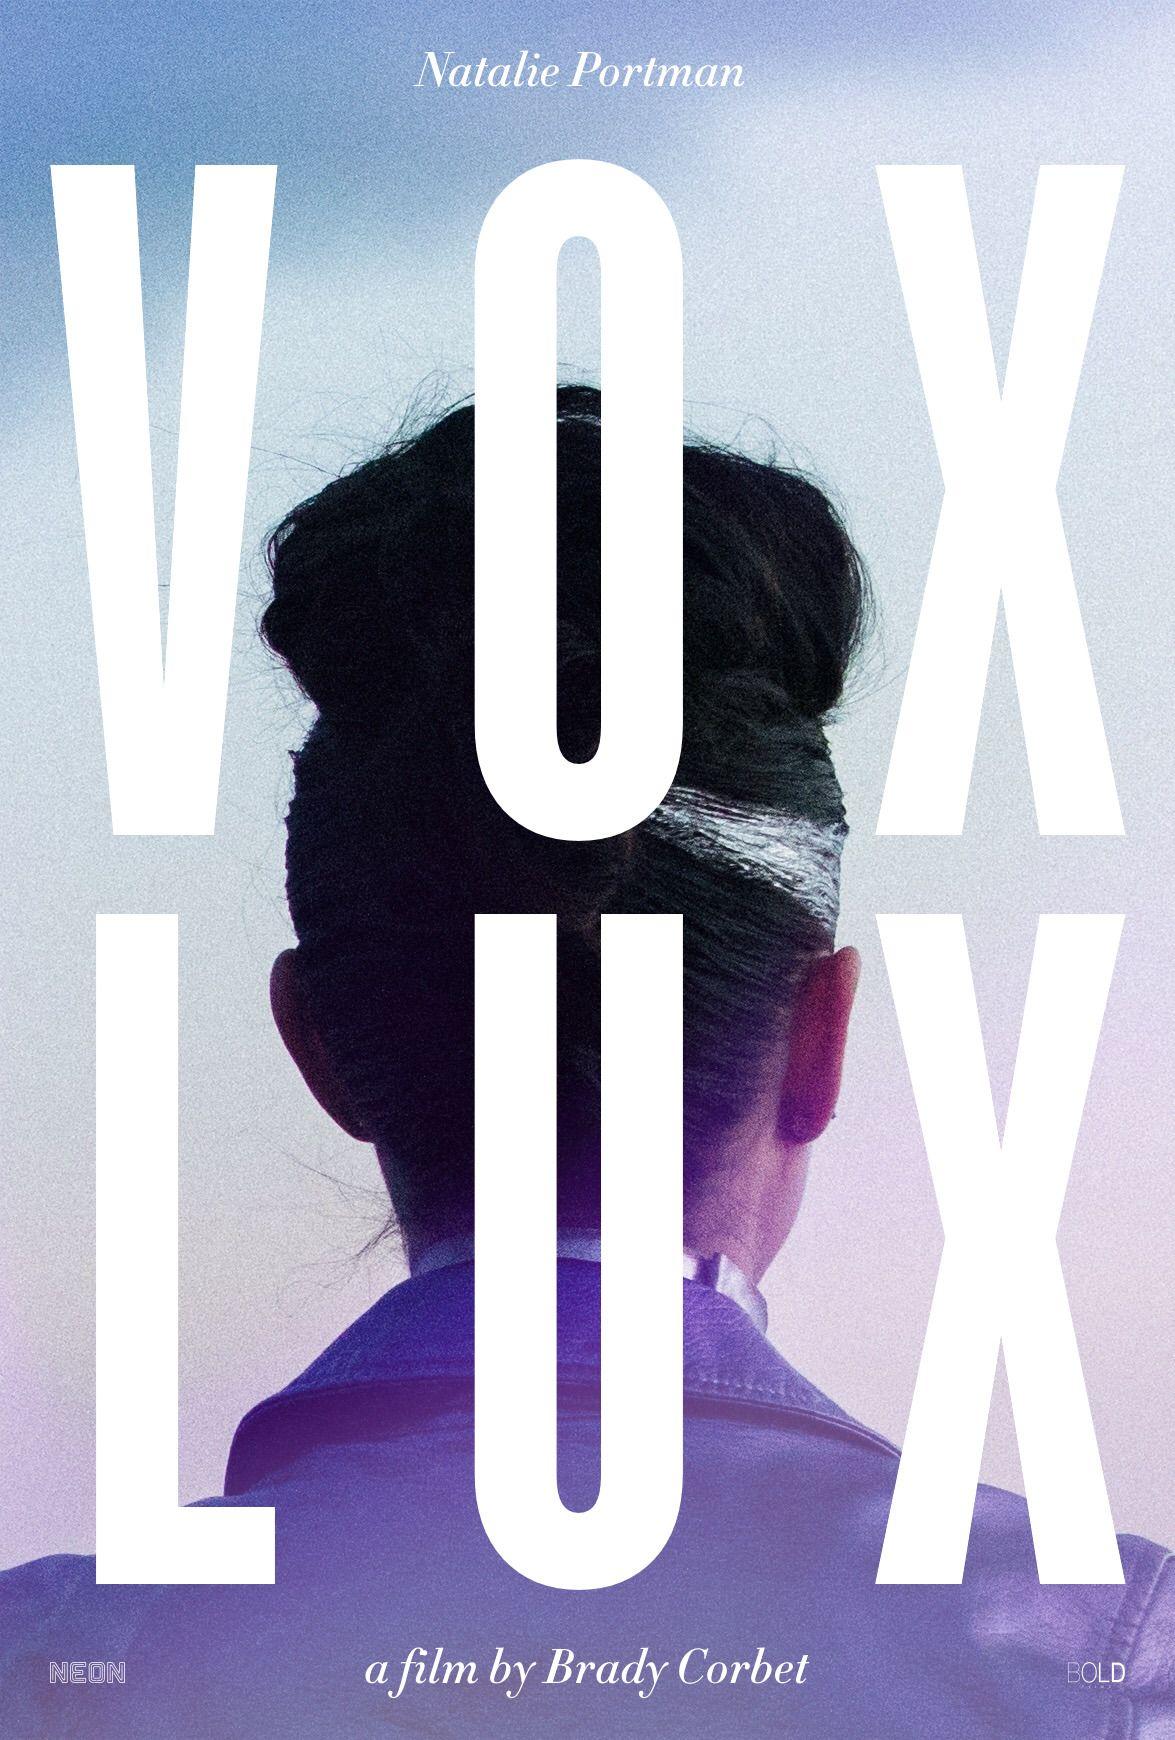 Vox Lux Dir Brady Corbet 2018 Brady Corbet Title Card Vox